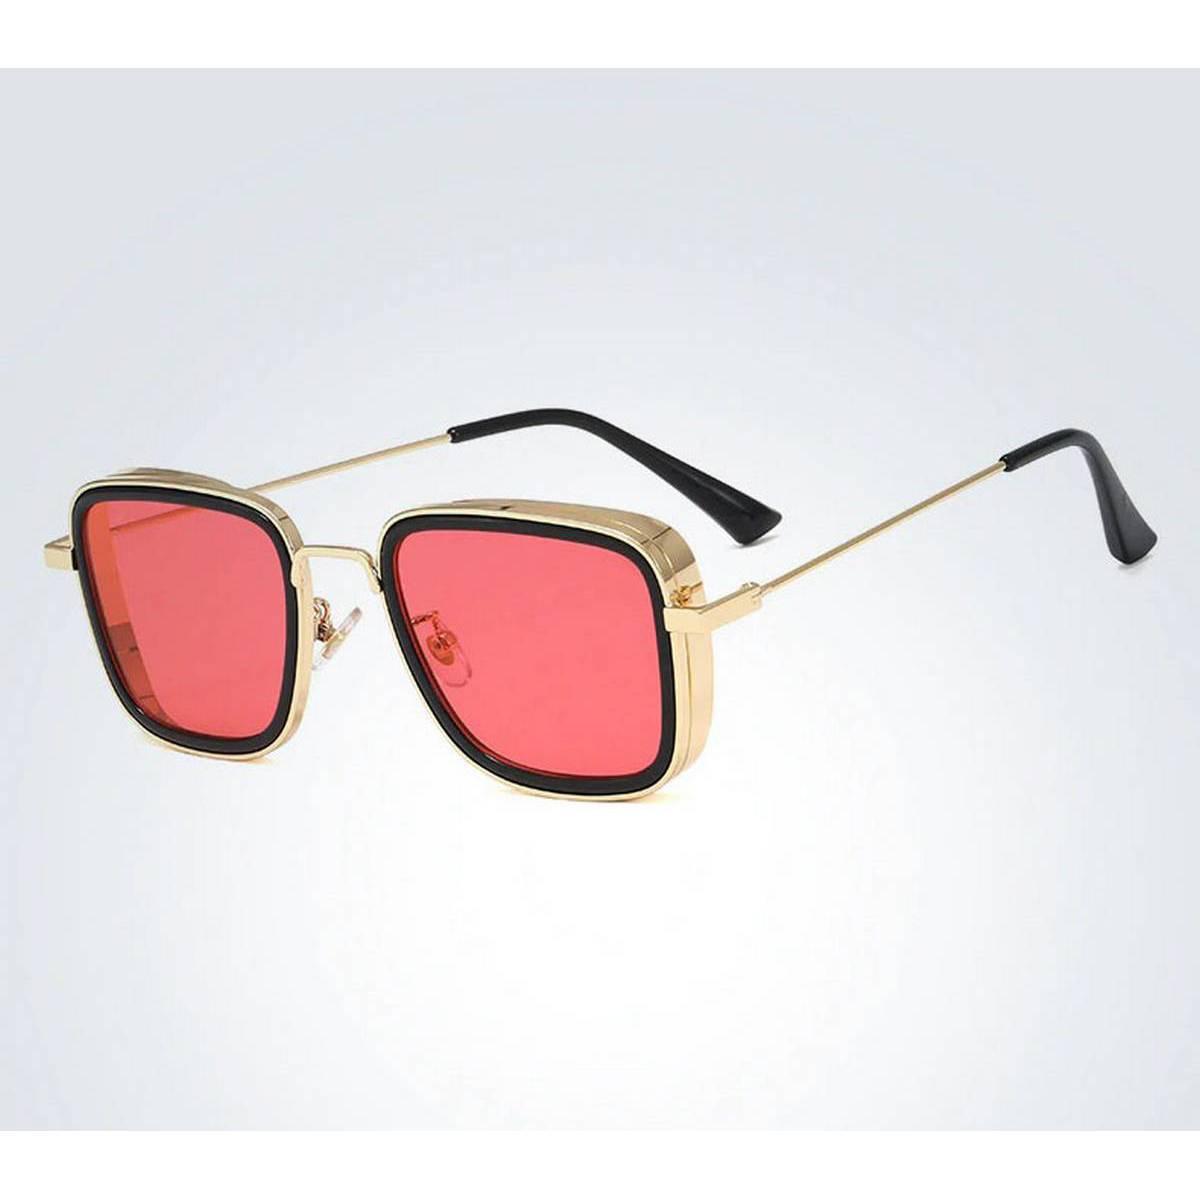 Kabir Singh India Movie Sunglasses Men Square Retro Cool Sun Shades Steampunk Style Sun Glasses for Men Metal Frame